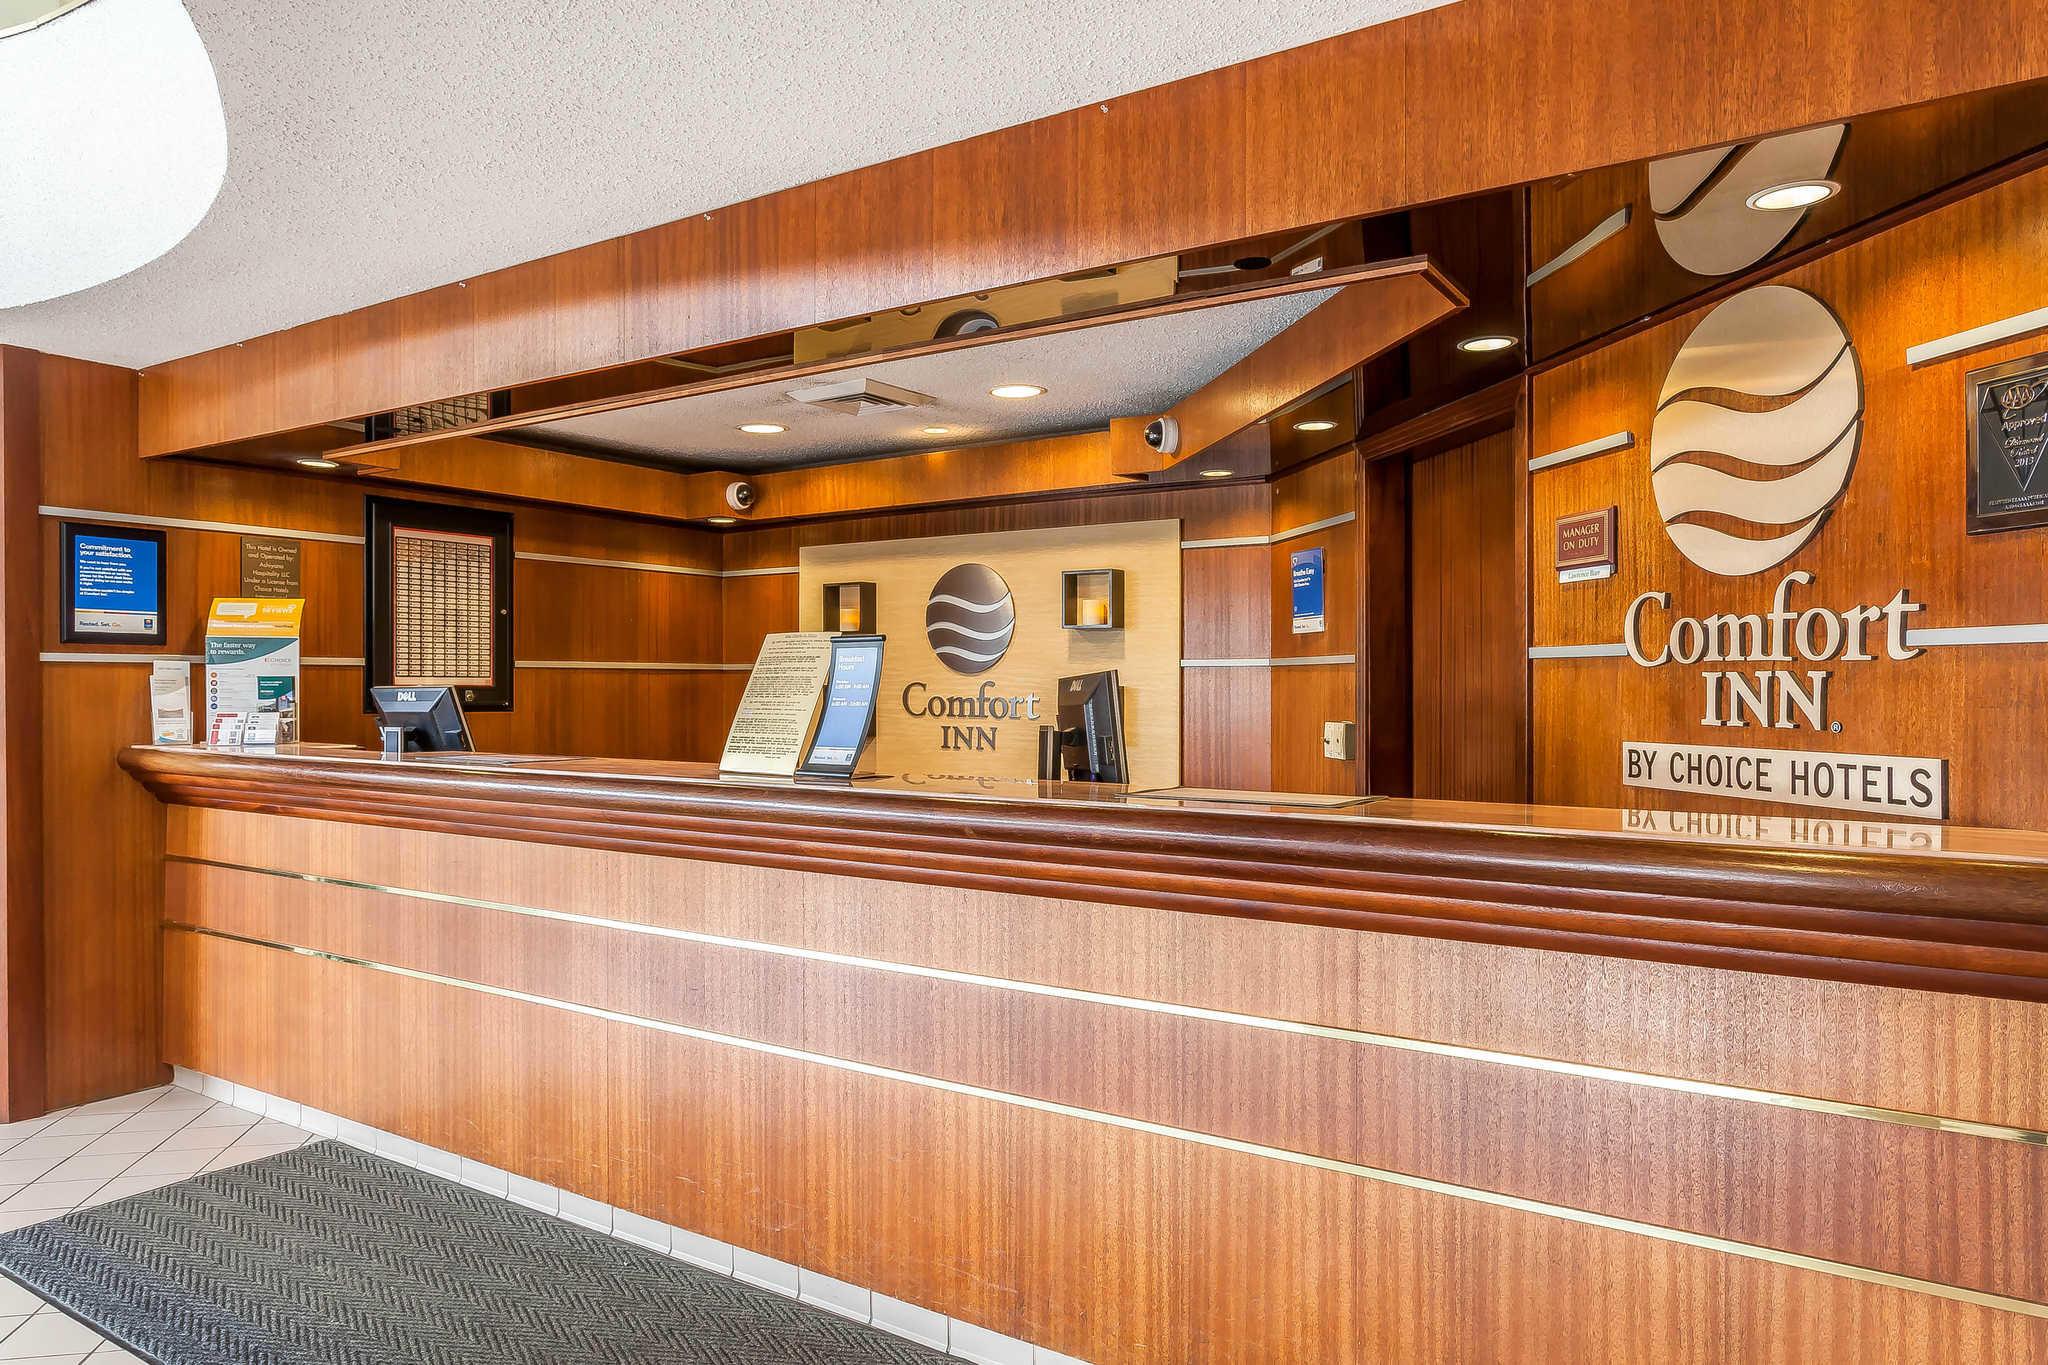 Comfort Inn Cleveland Airport image 3